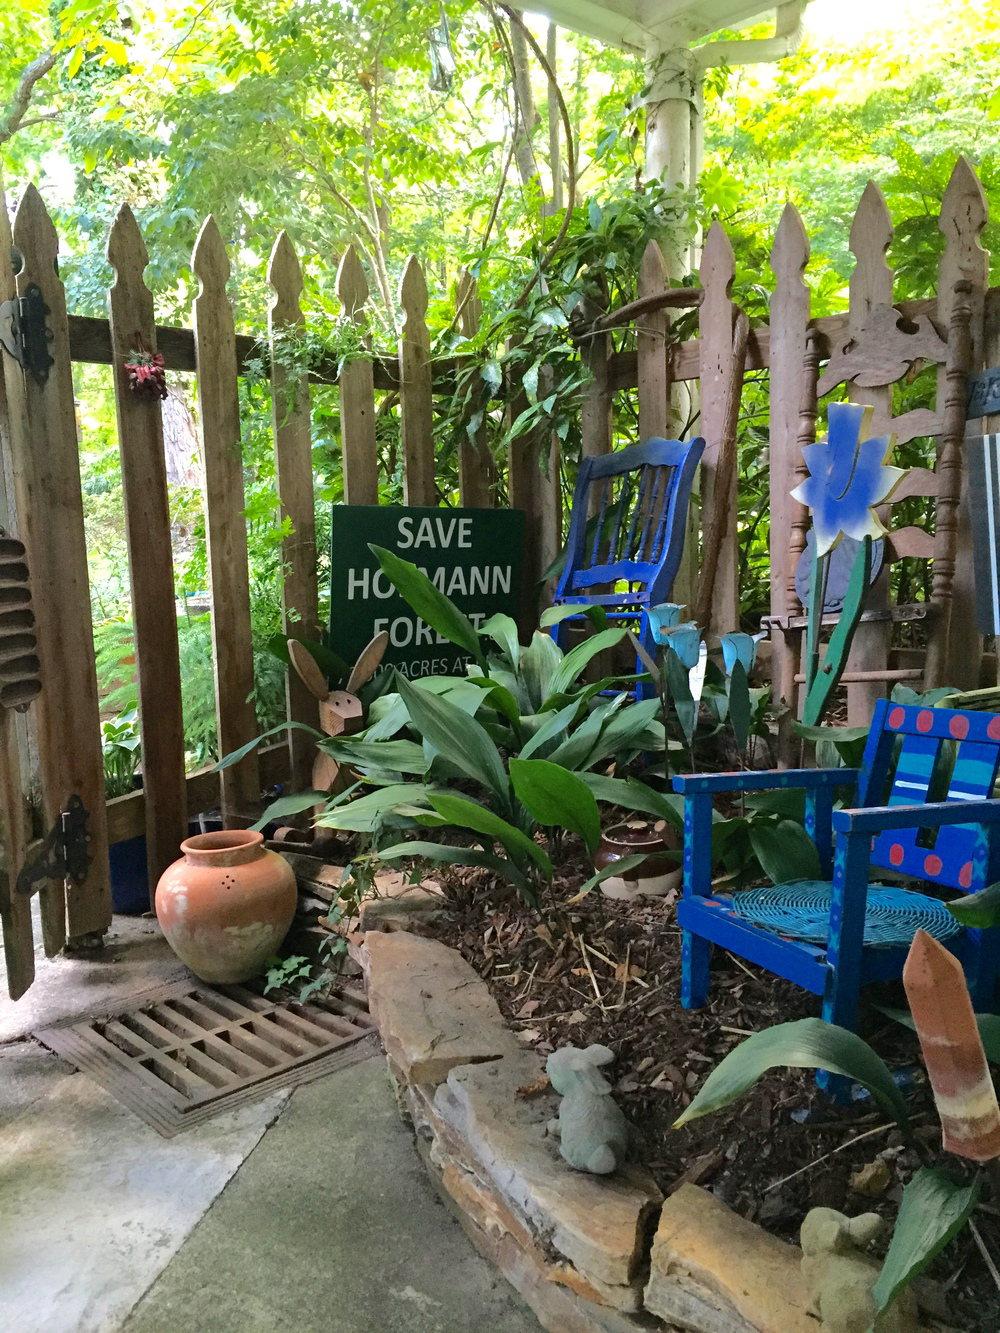 carport-garden-IMG_1247creative-friends-series.JPG